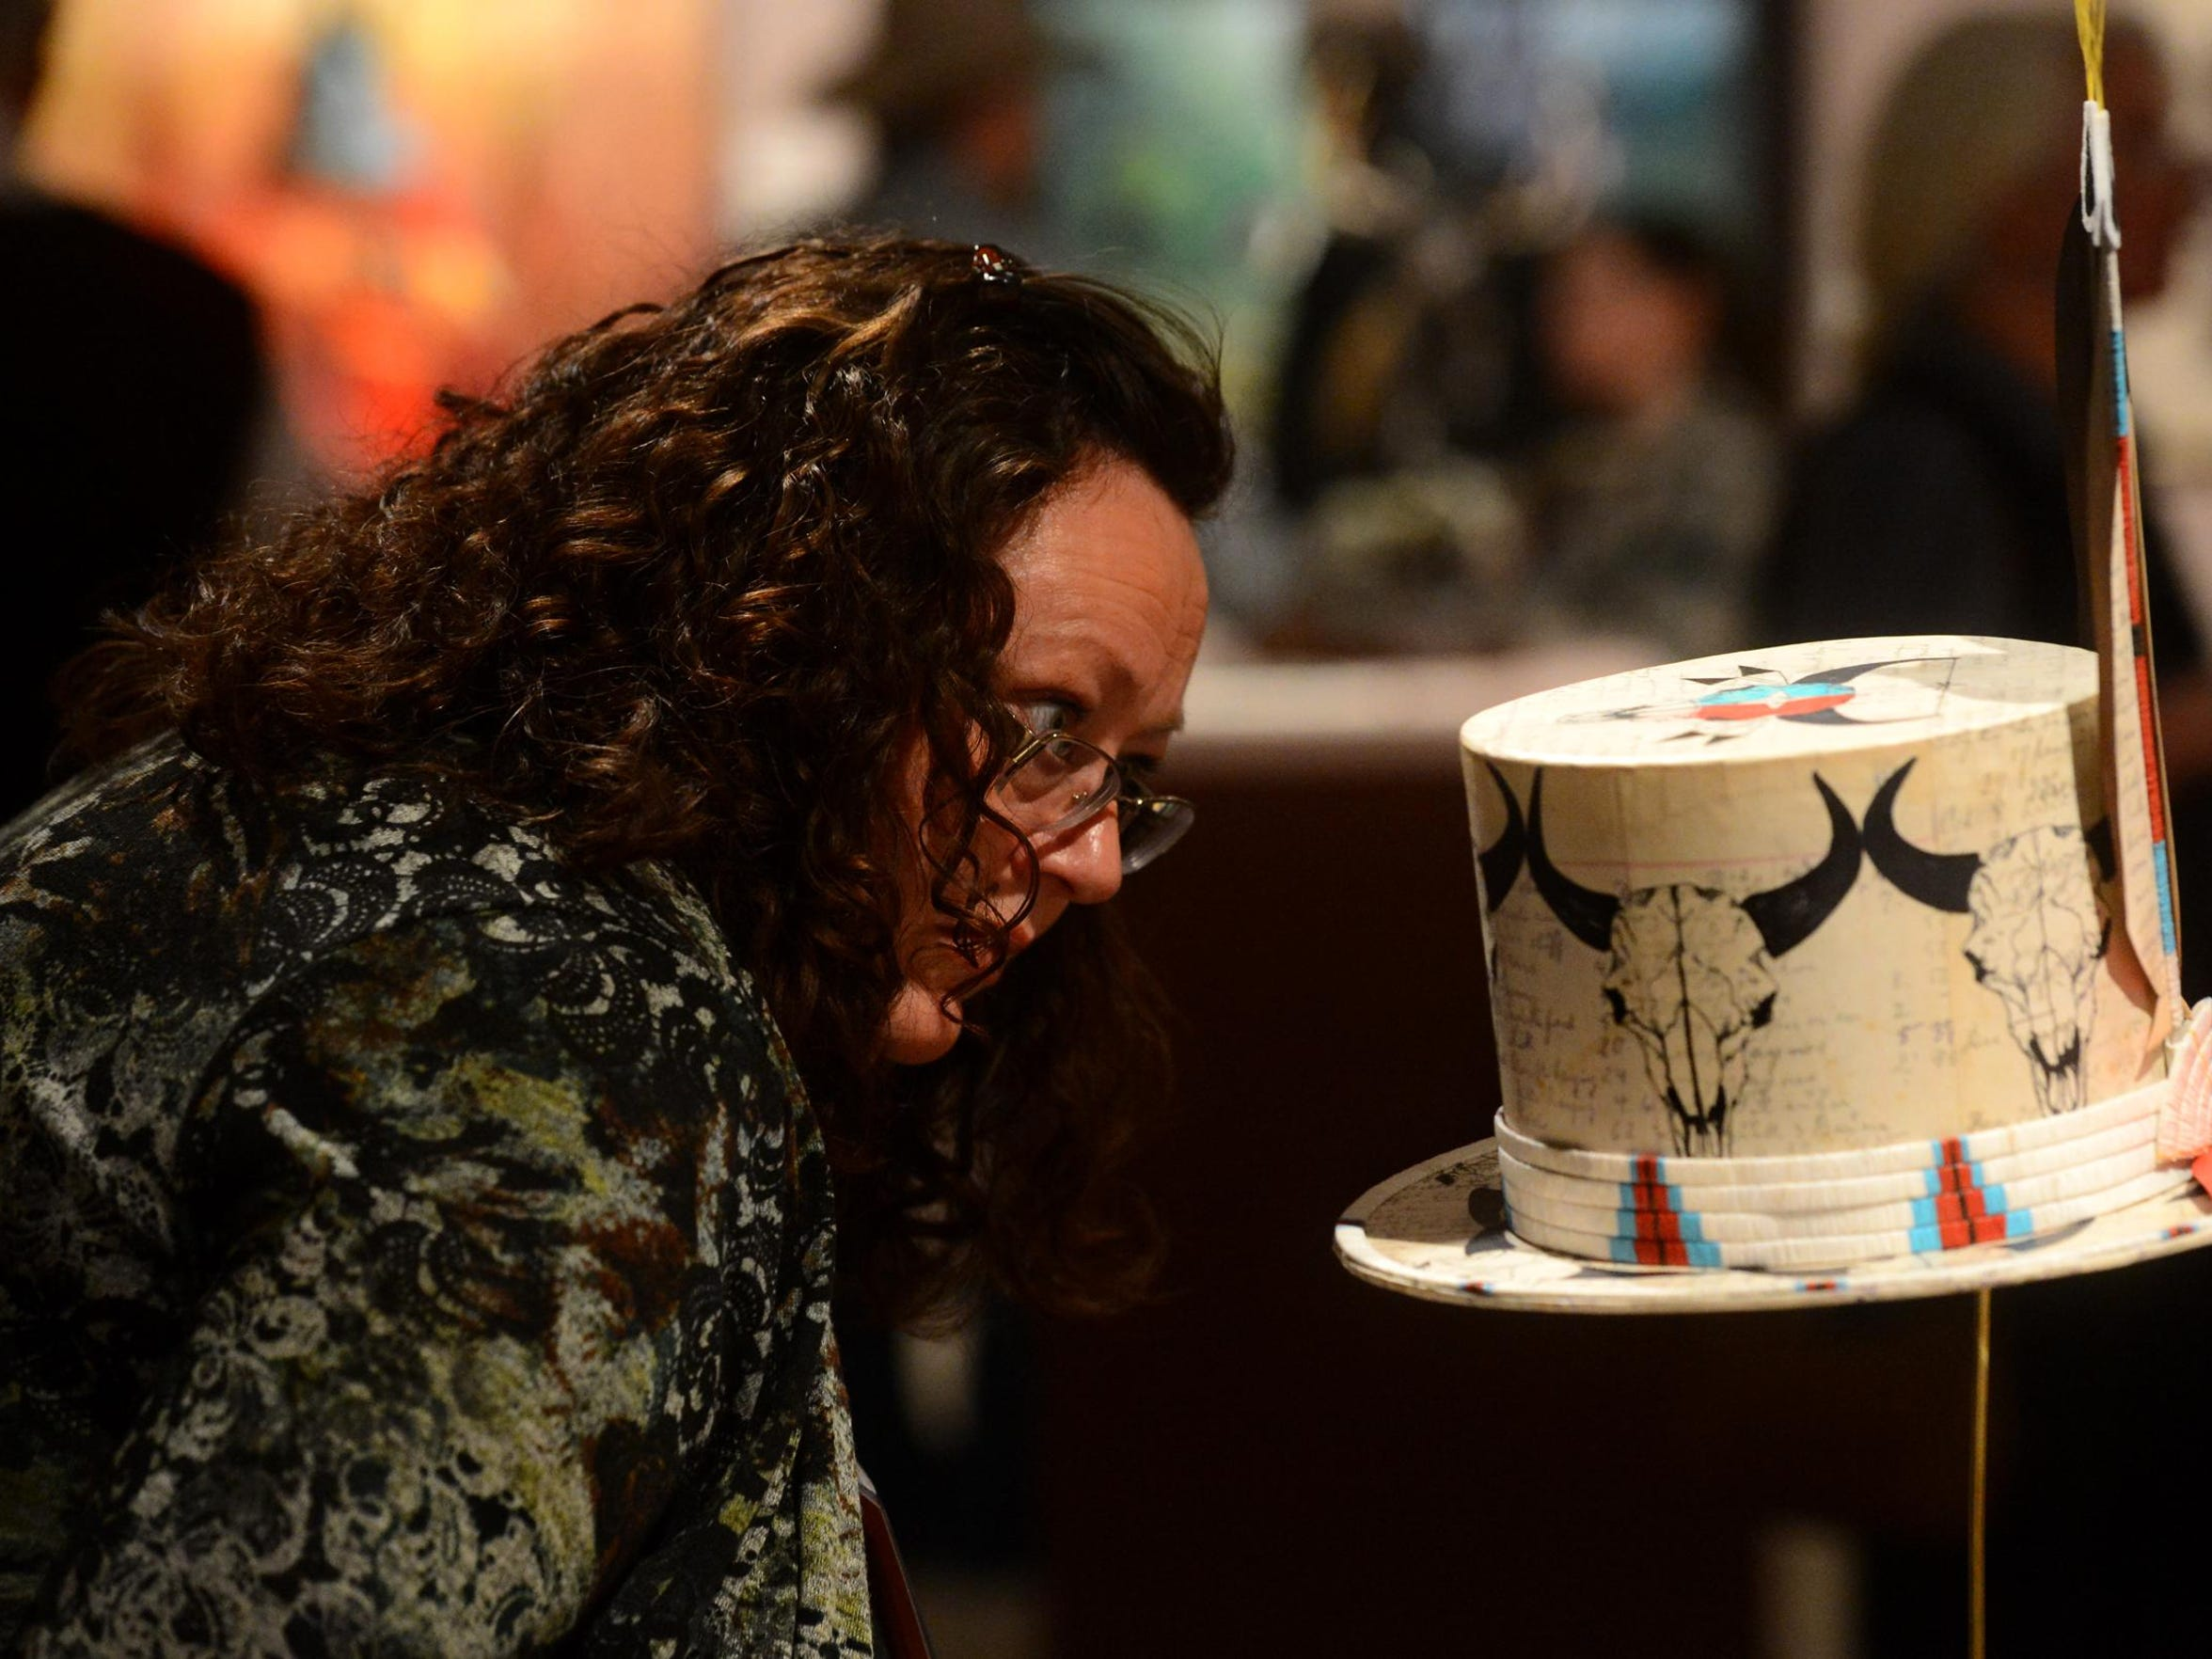 Jeanne Parker of Kalispell looks at a ledger art hat